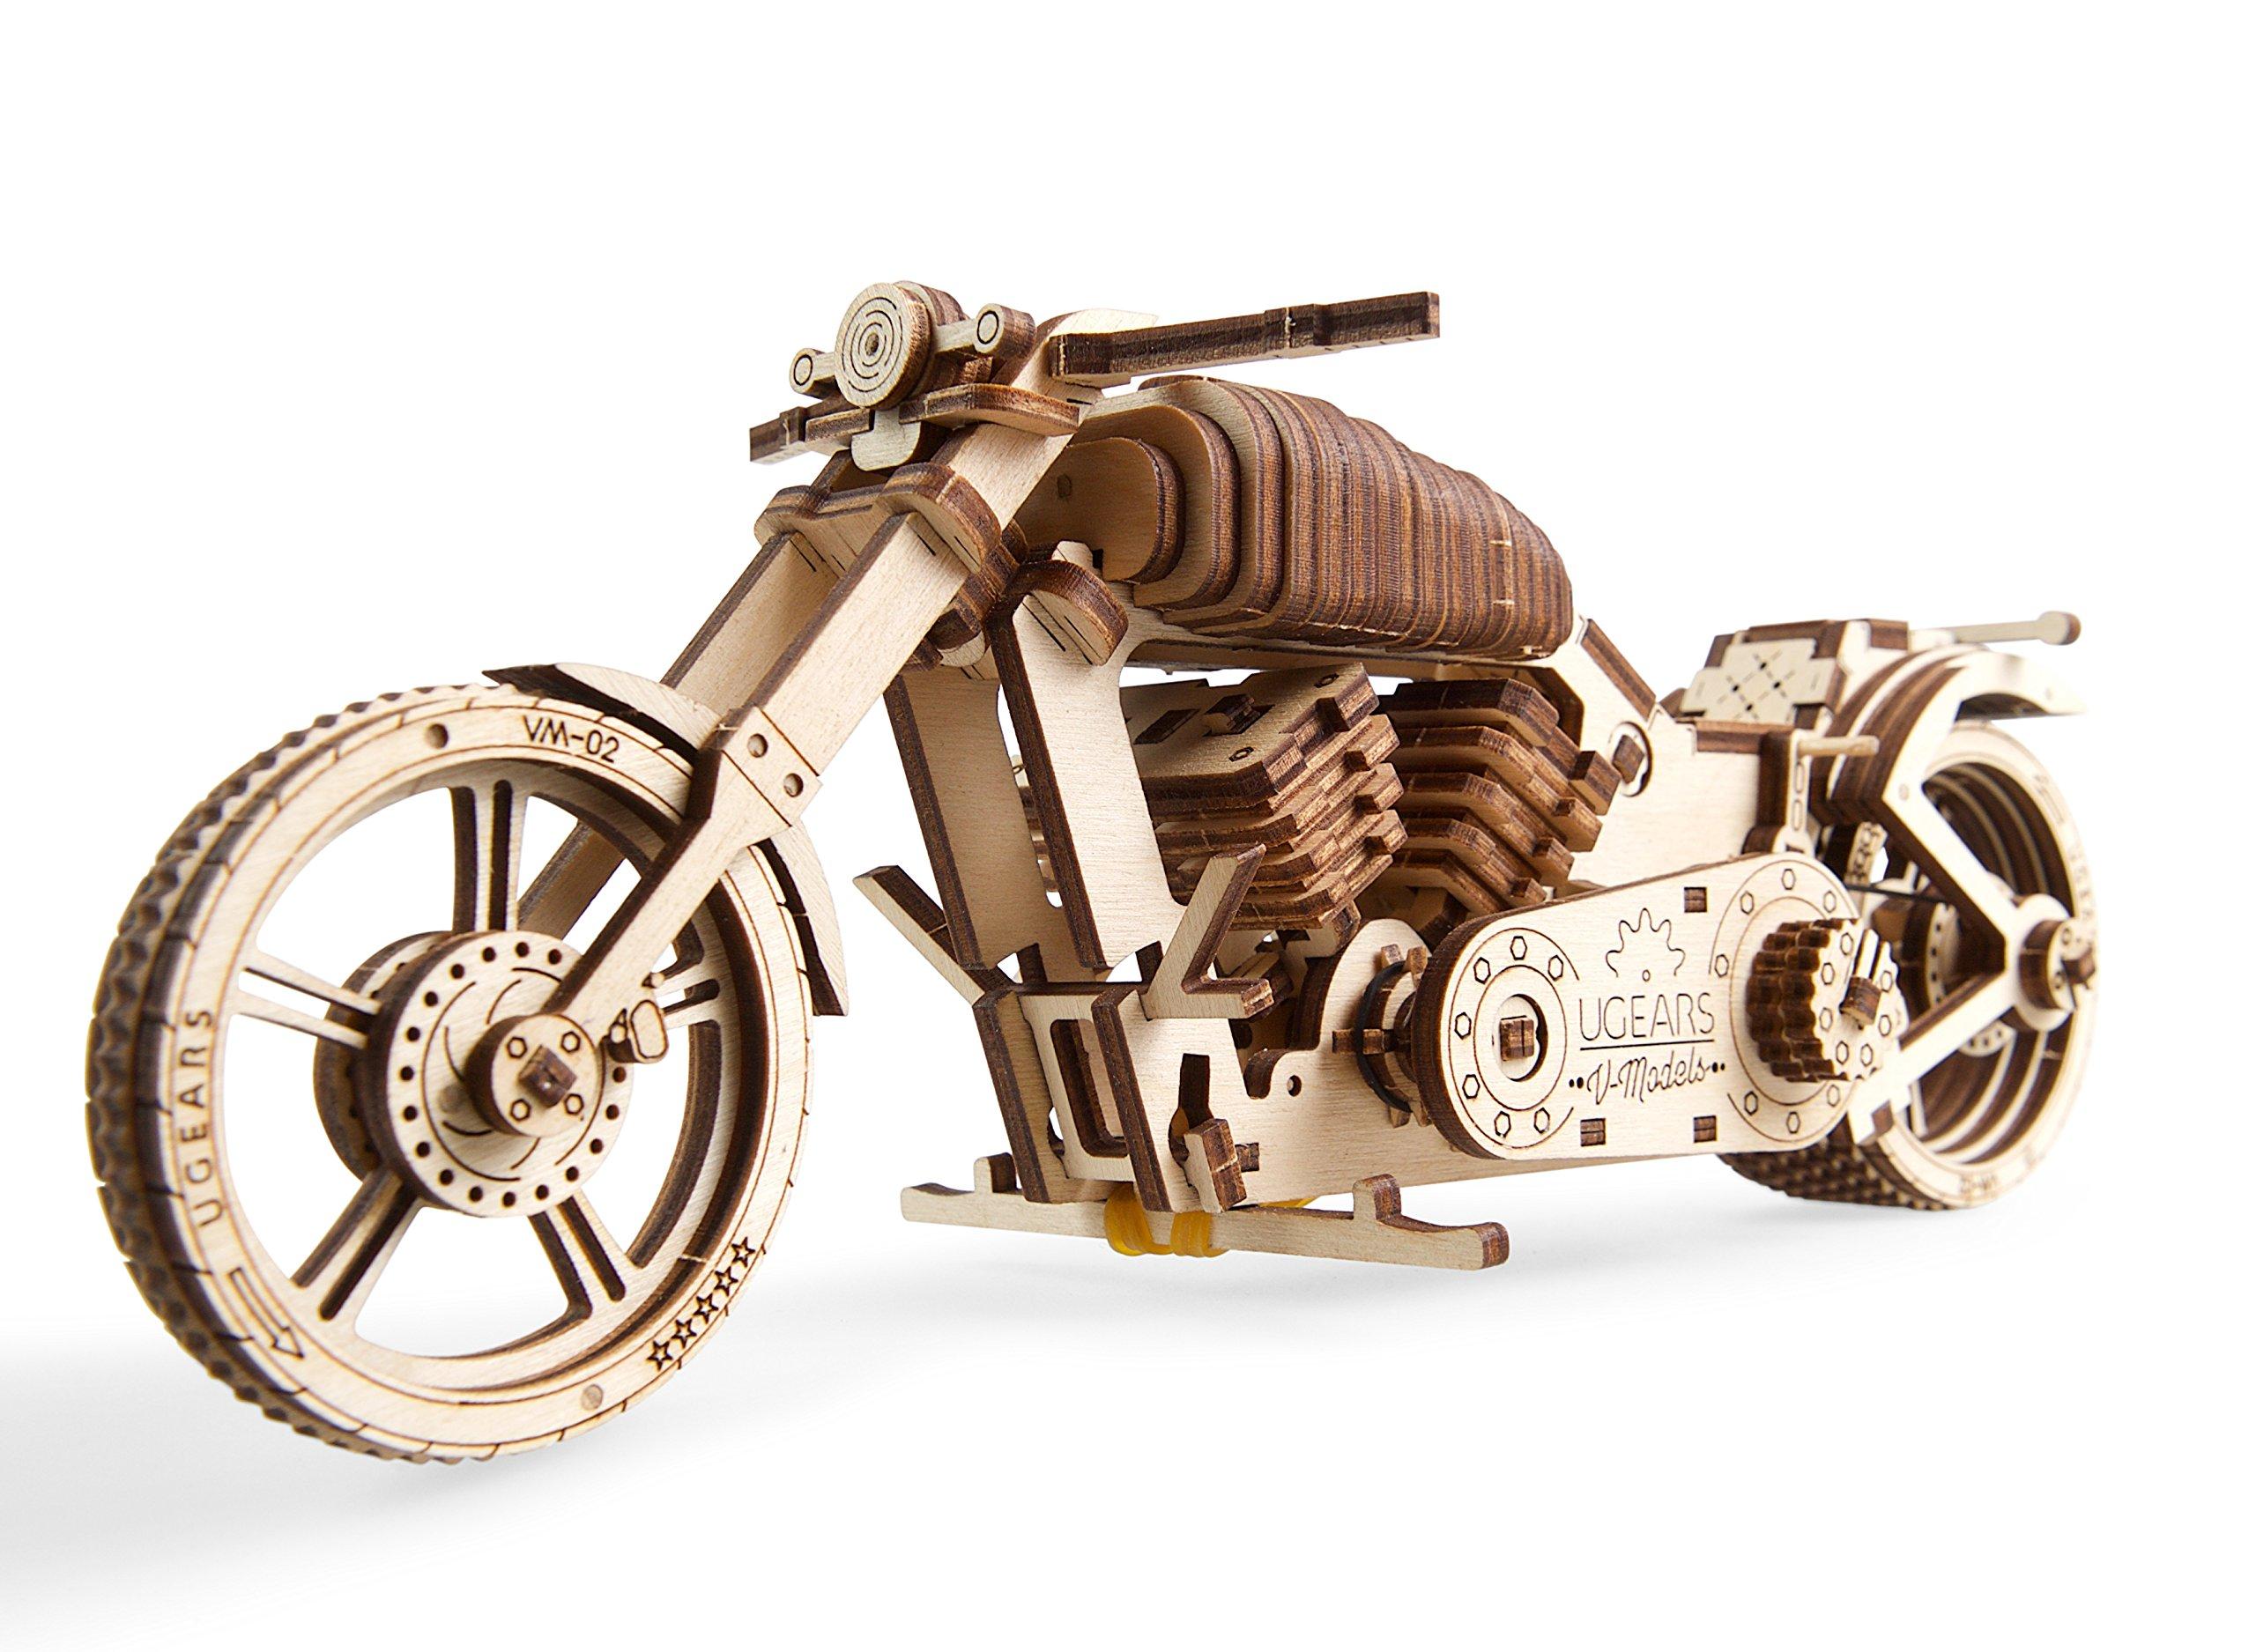 UGEARS Motocicleta VM-02 - Maqueta de Moto Mecánica - Puzzle 3D Madera - para Motoristas product image